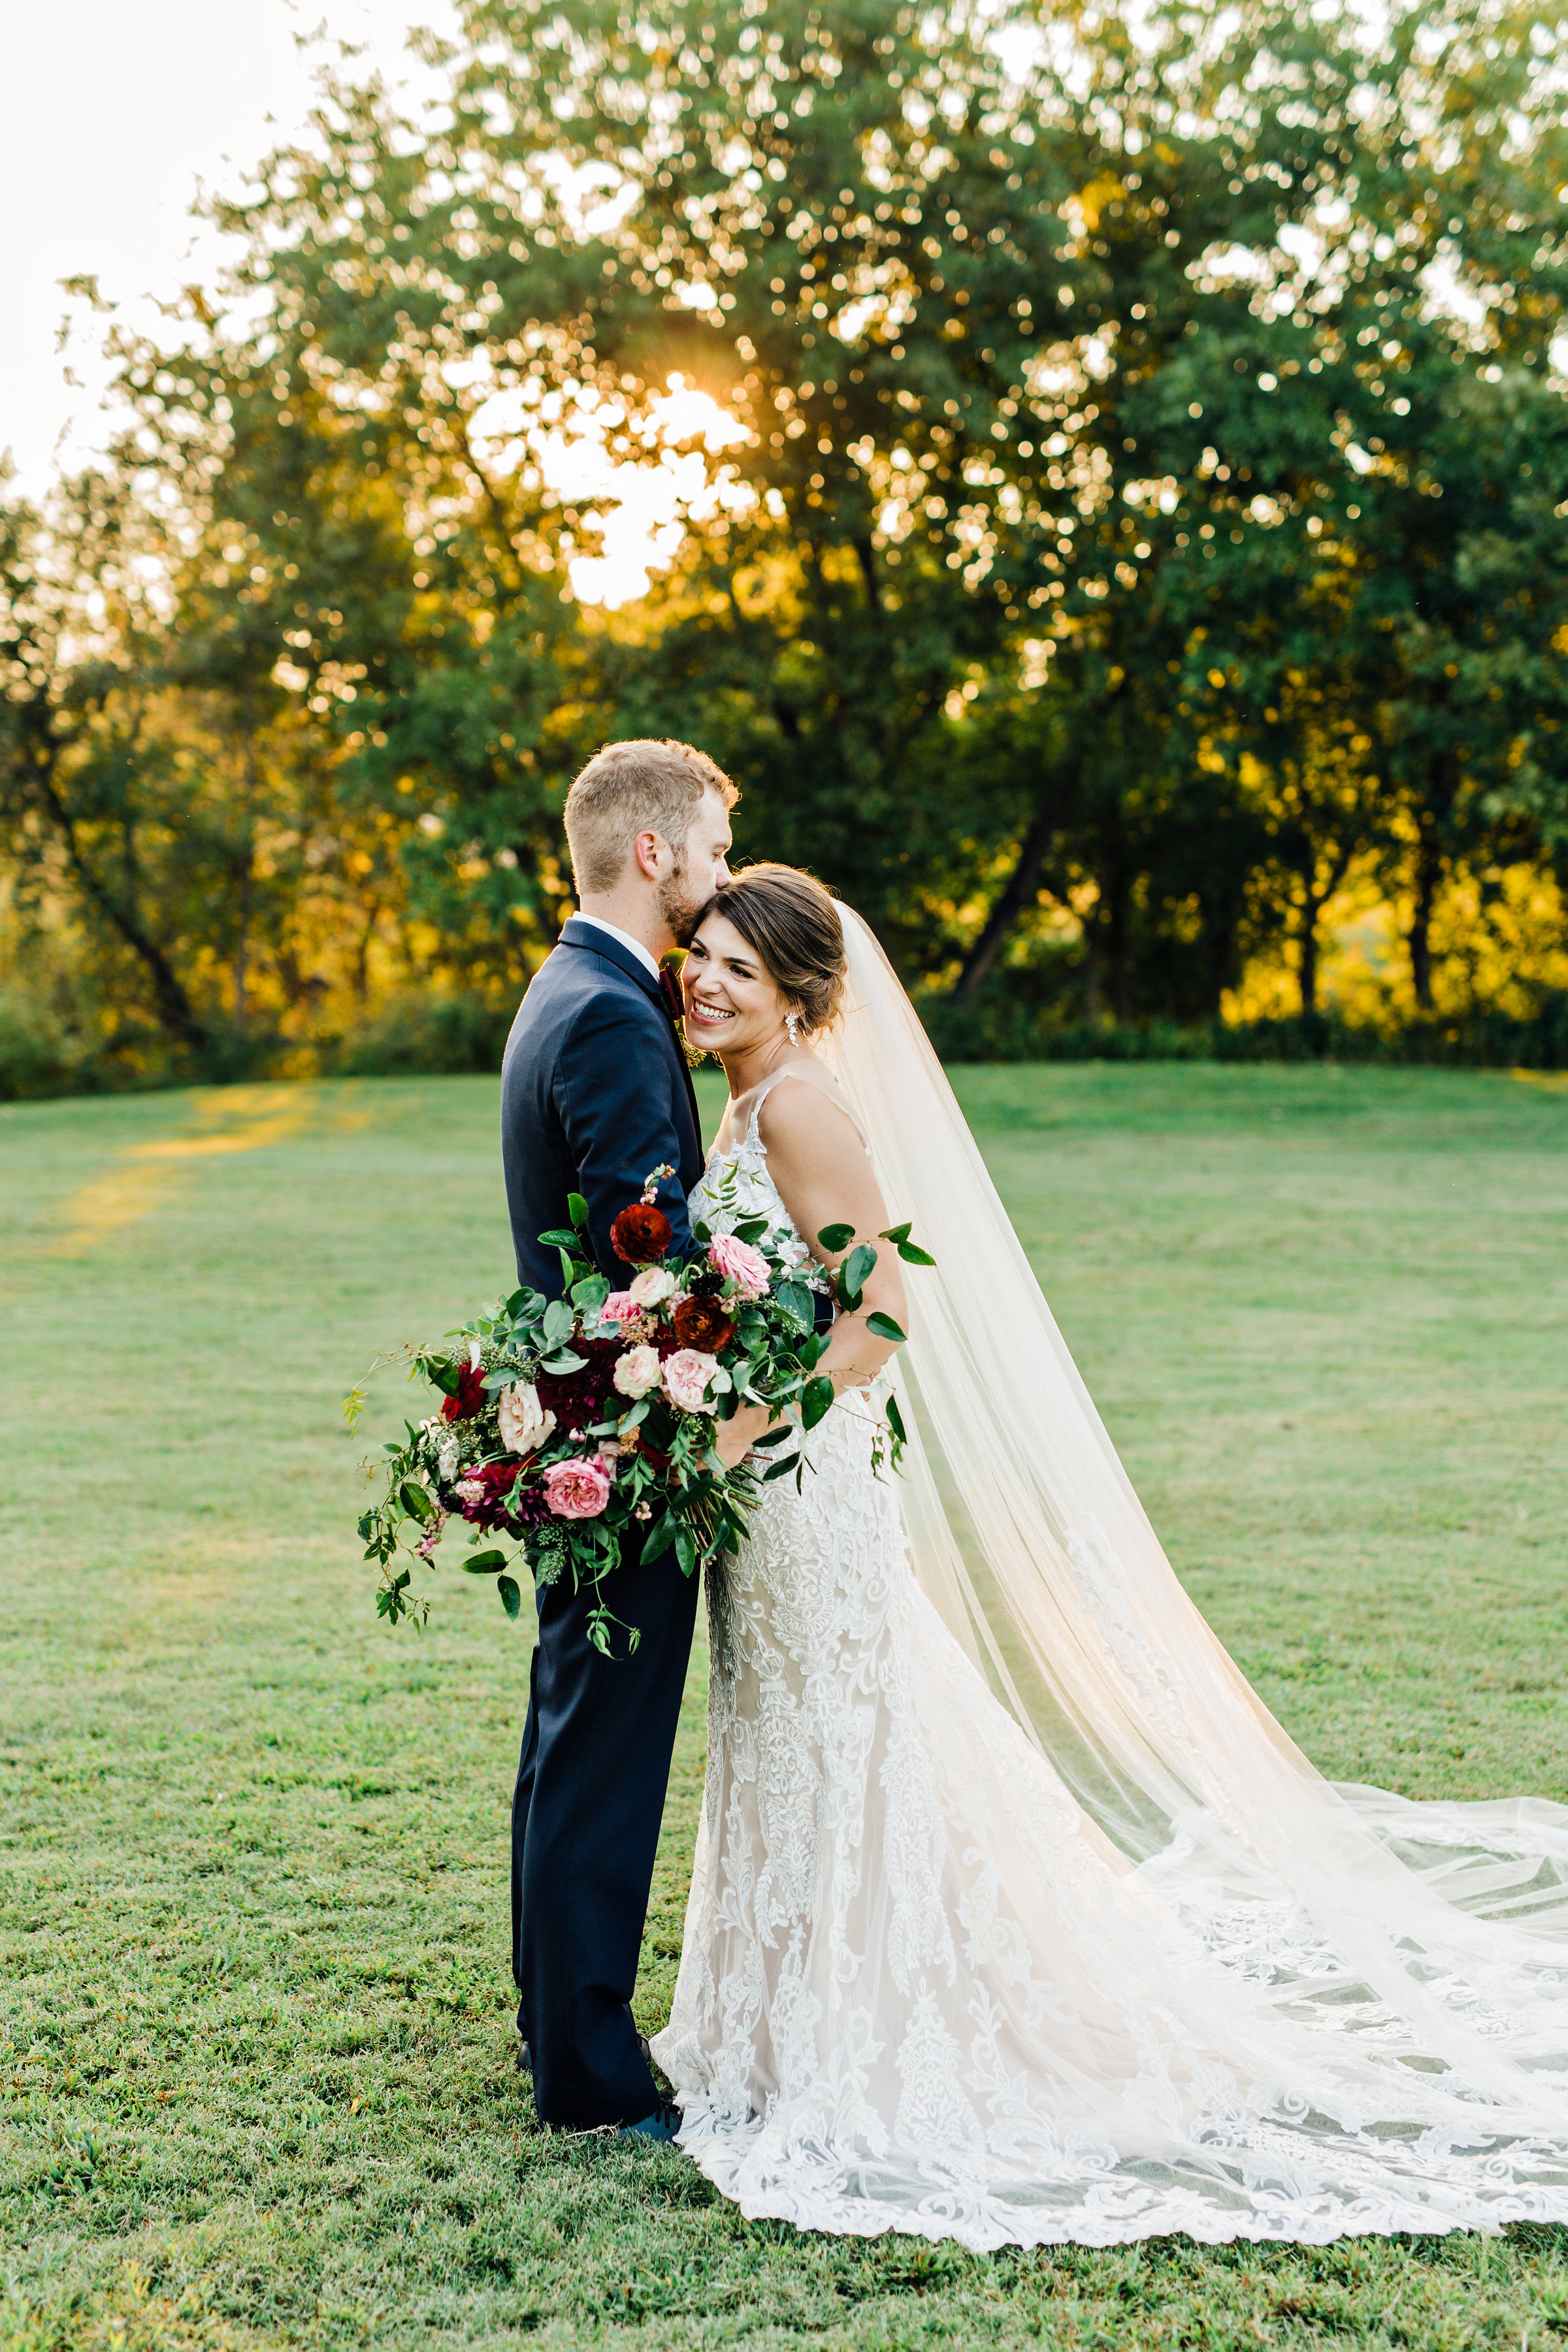 Sunset bride and groom portraits // Lush  marsala wedding florals